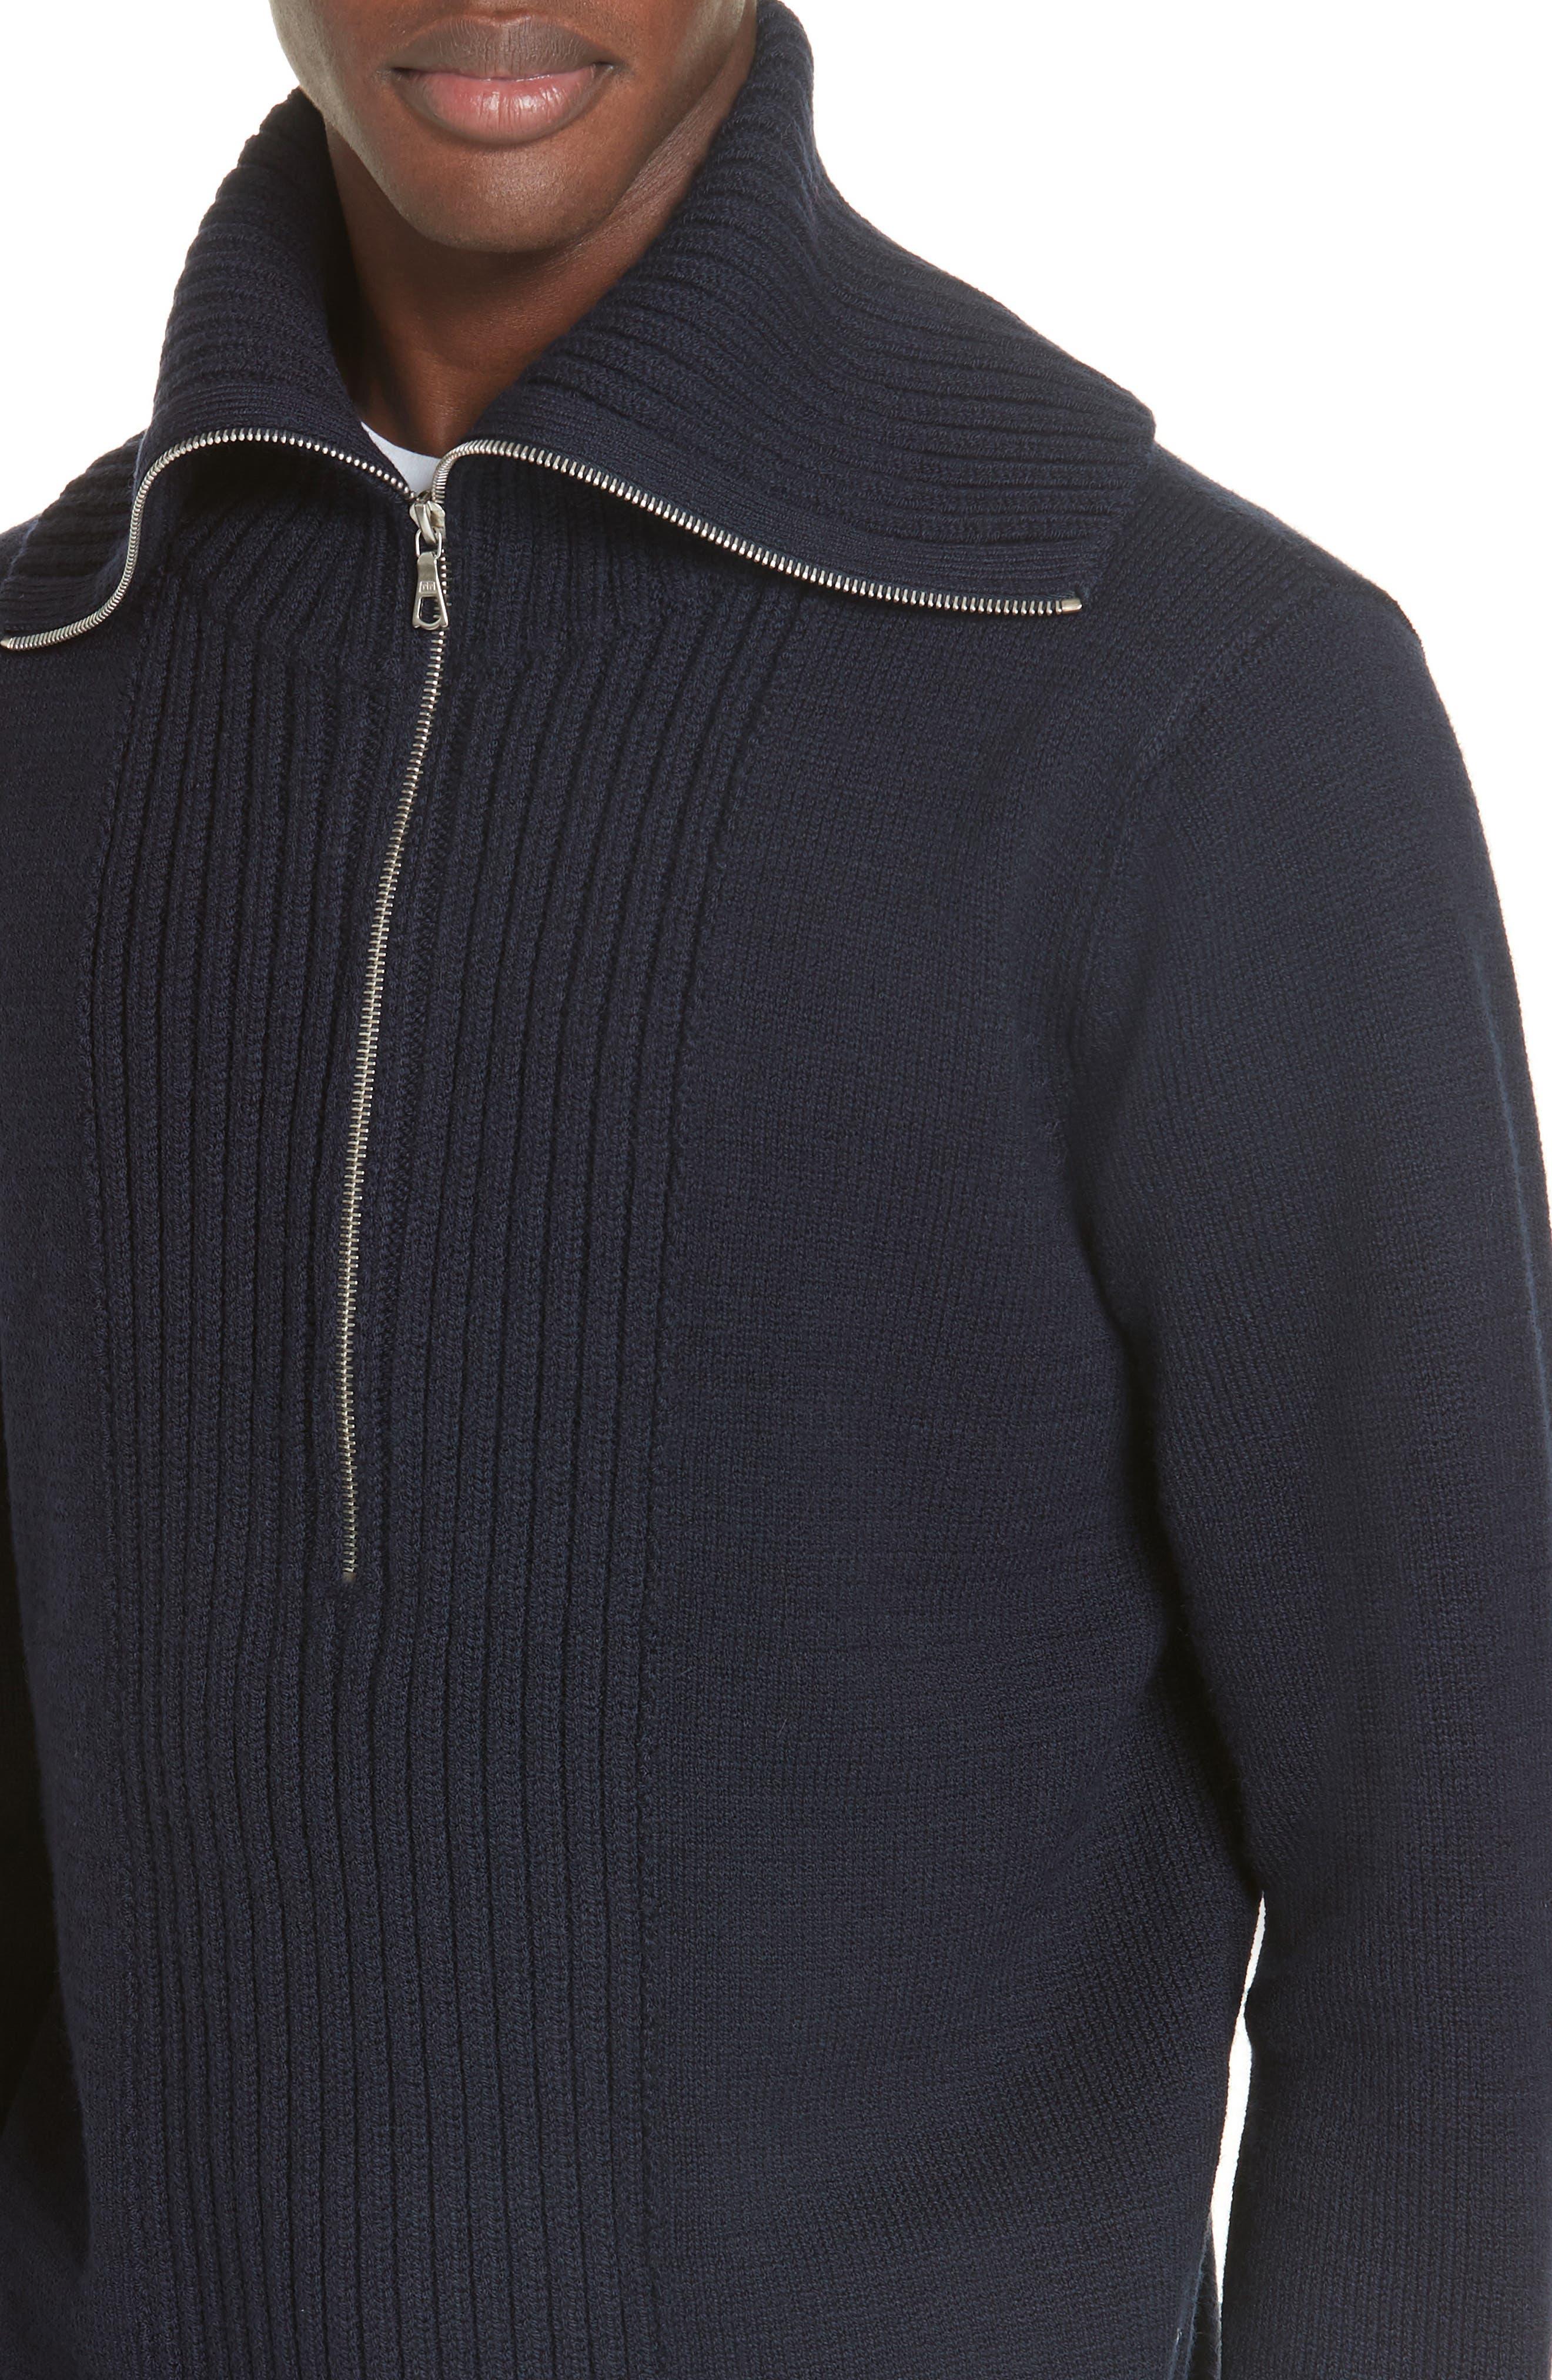 Mikhos Half Zip Sweater,                             Alternate thumbnail 4, color,                             NAVY